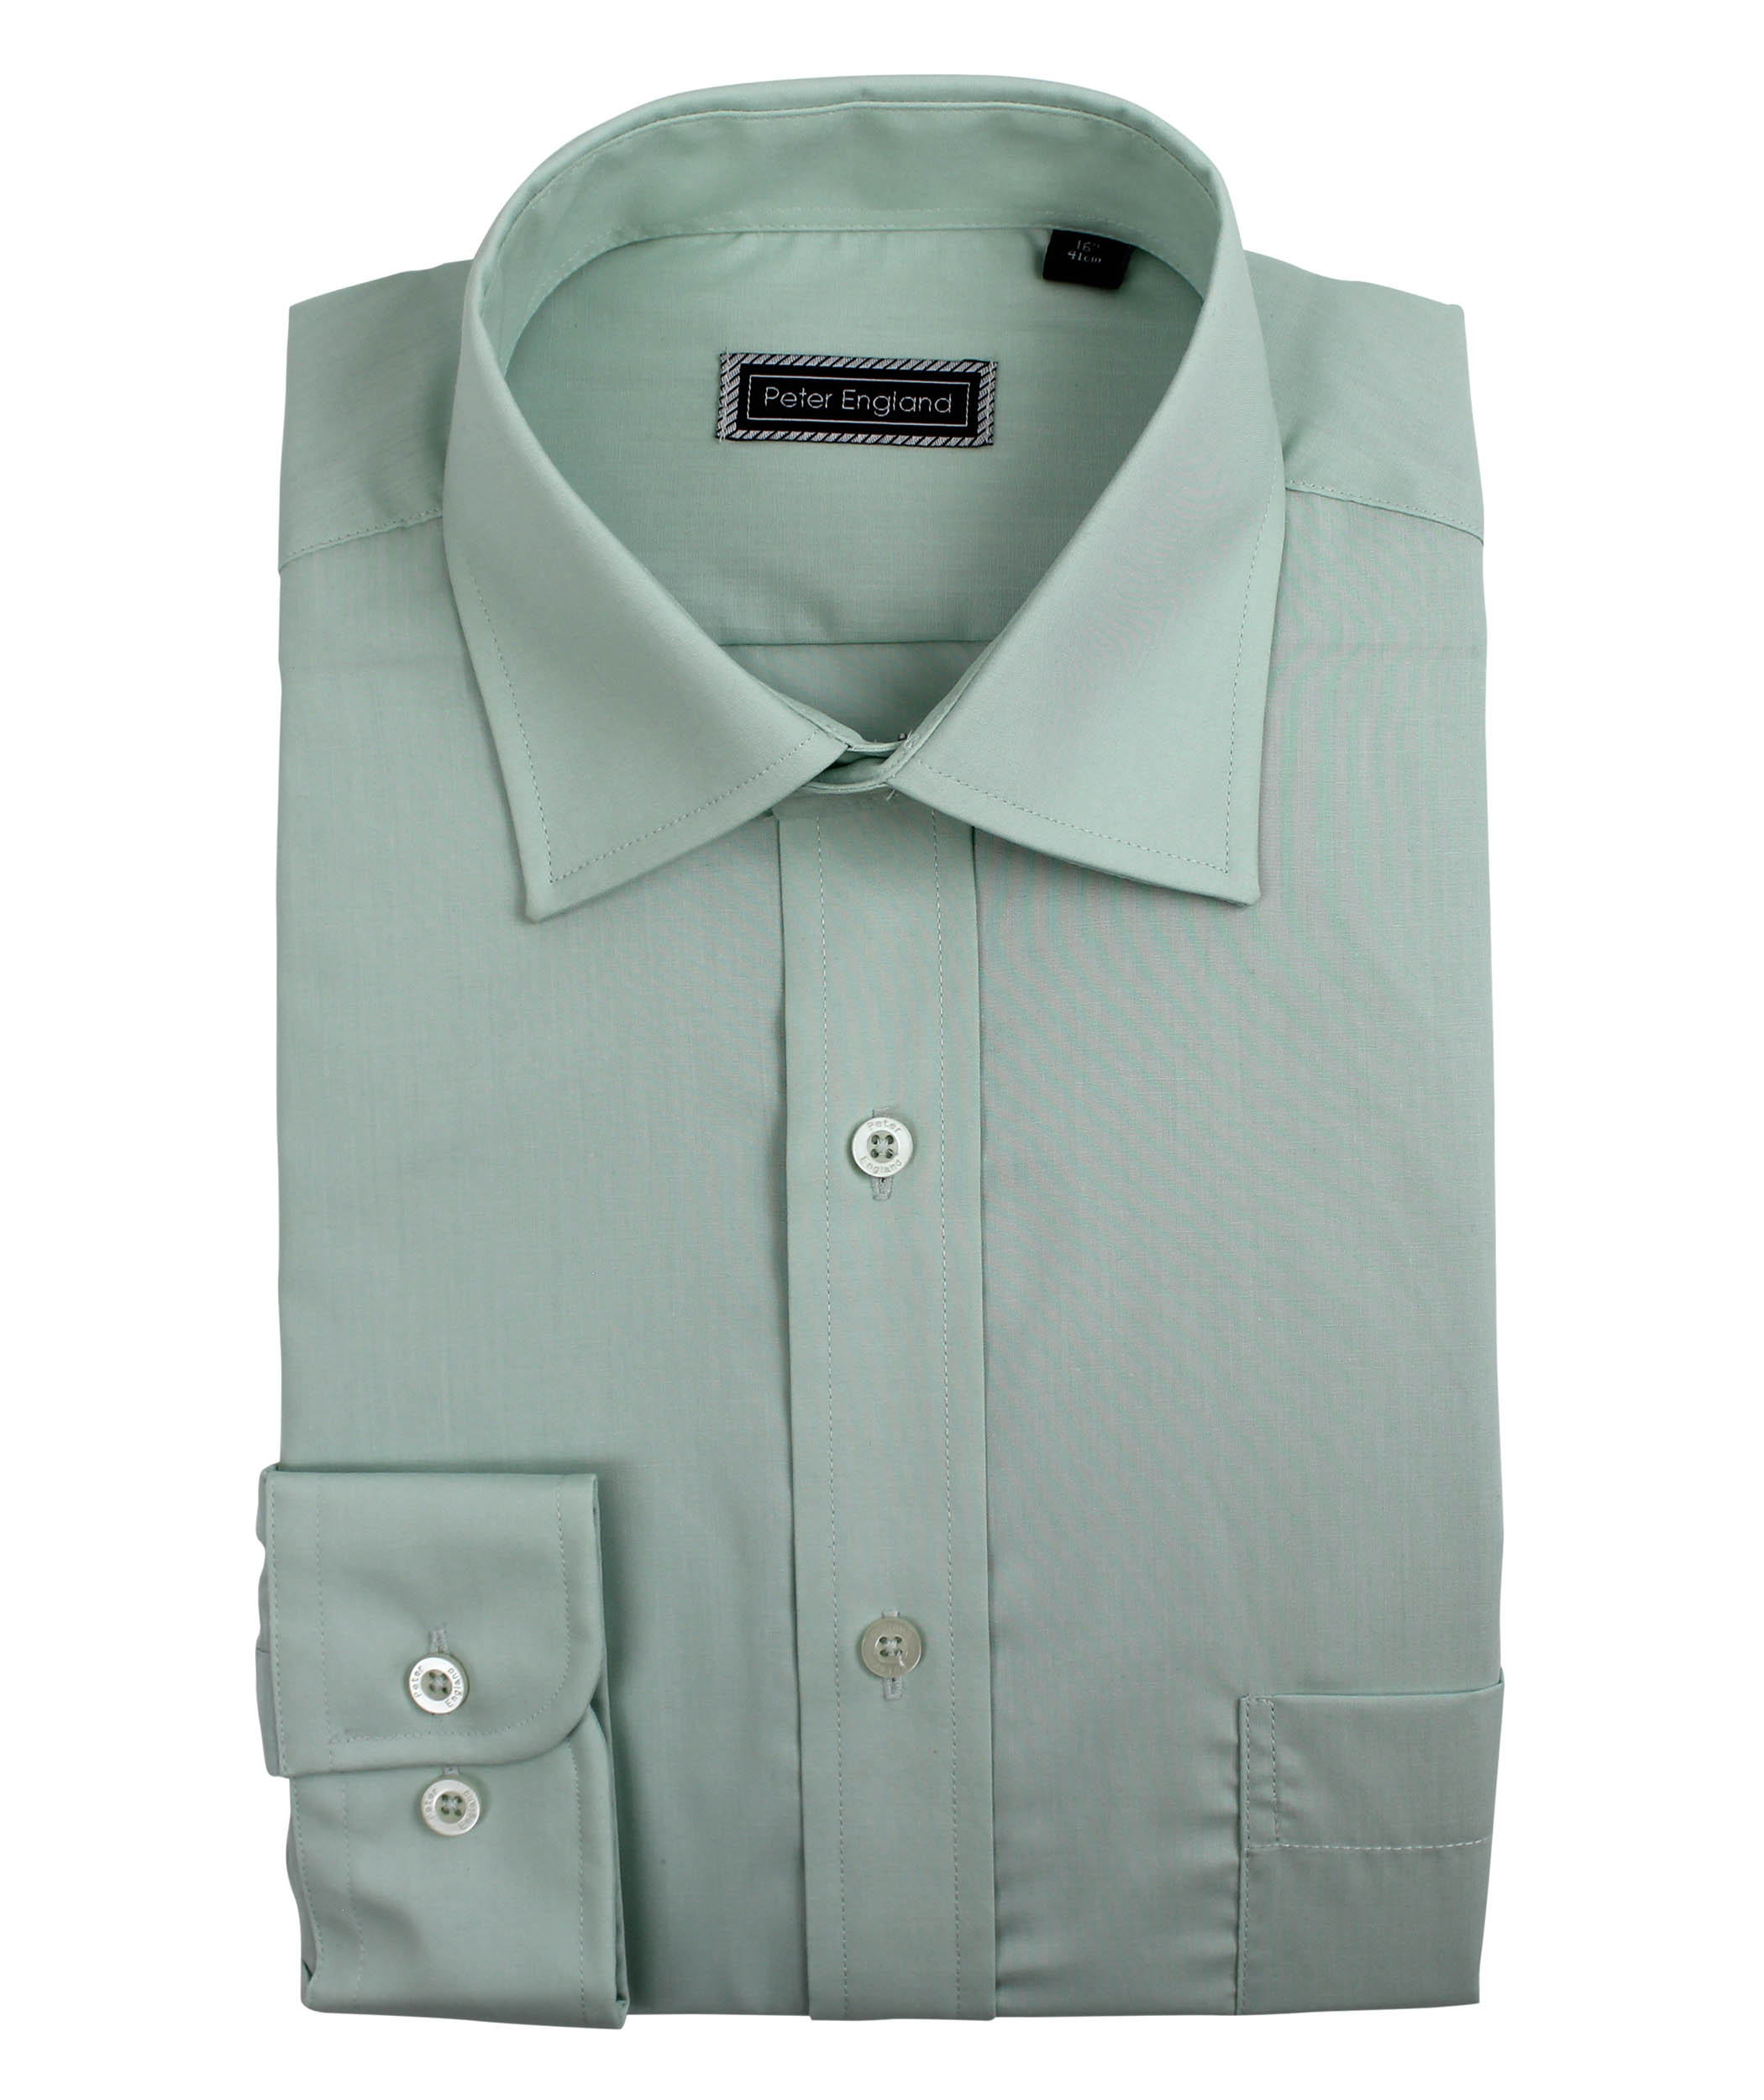 Peter-England-Mens-Plain-Shirt